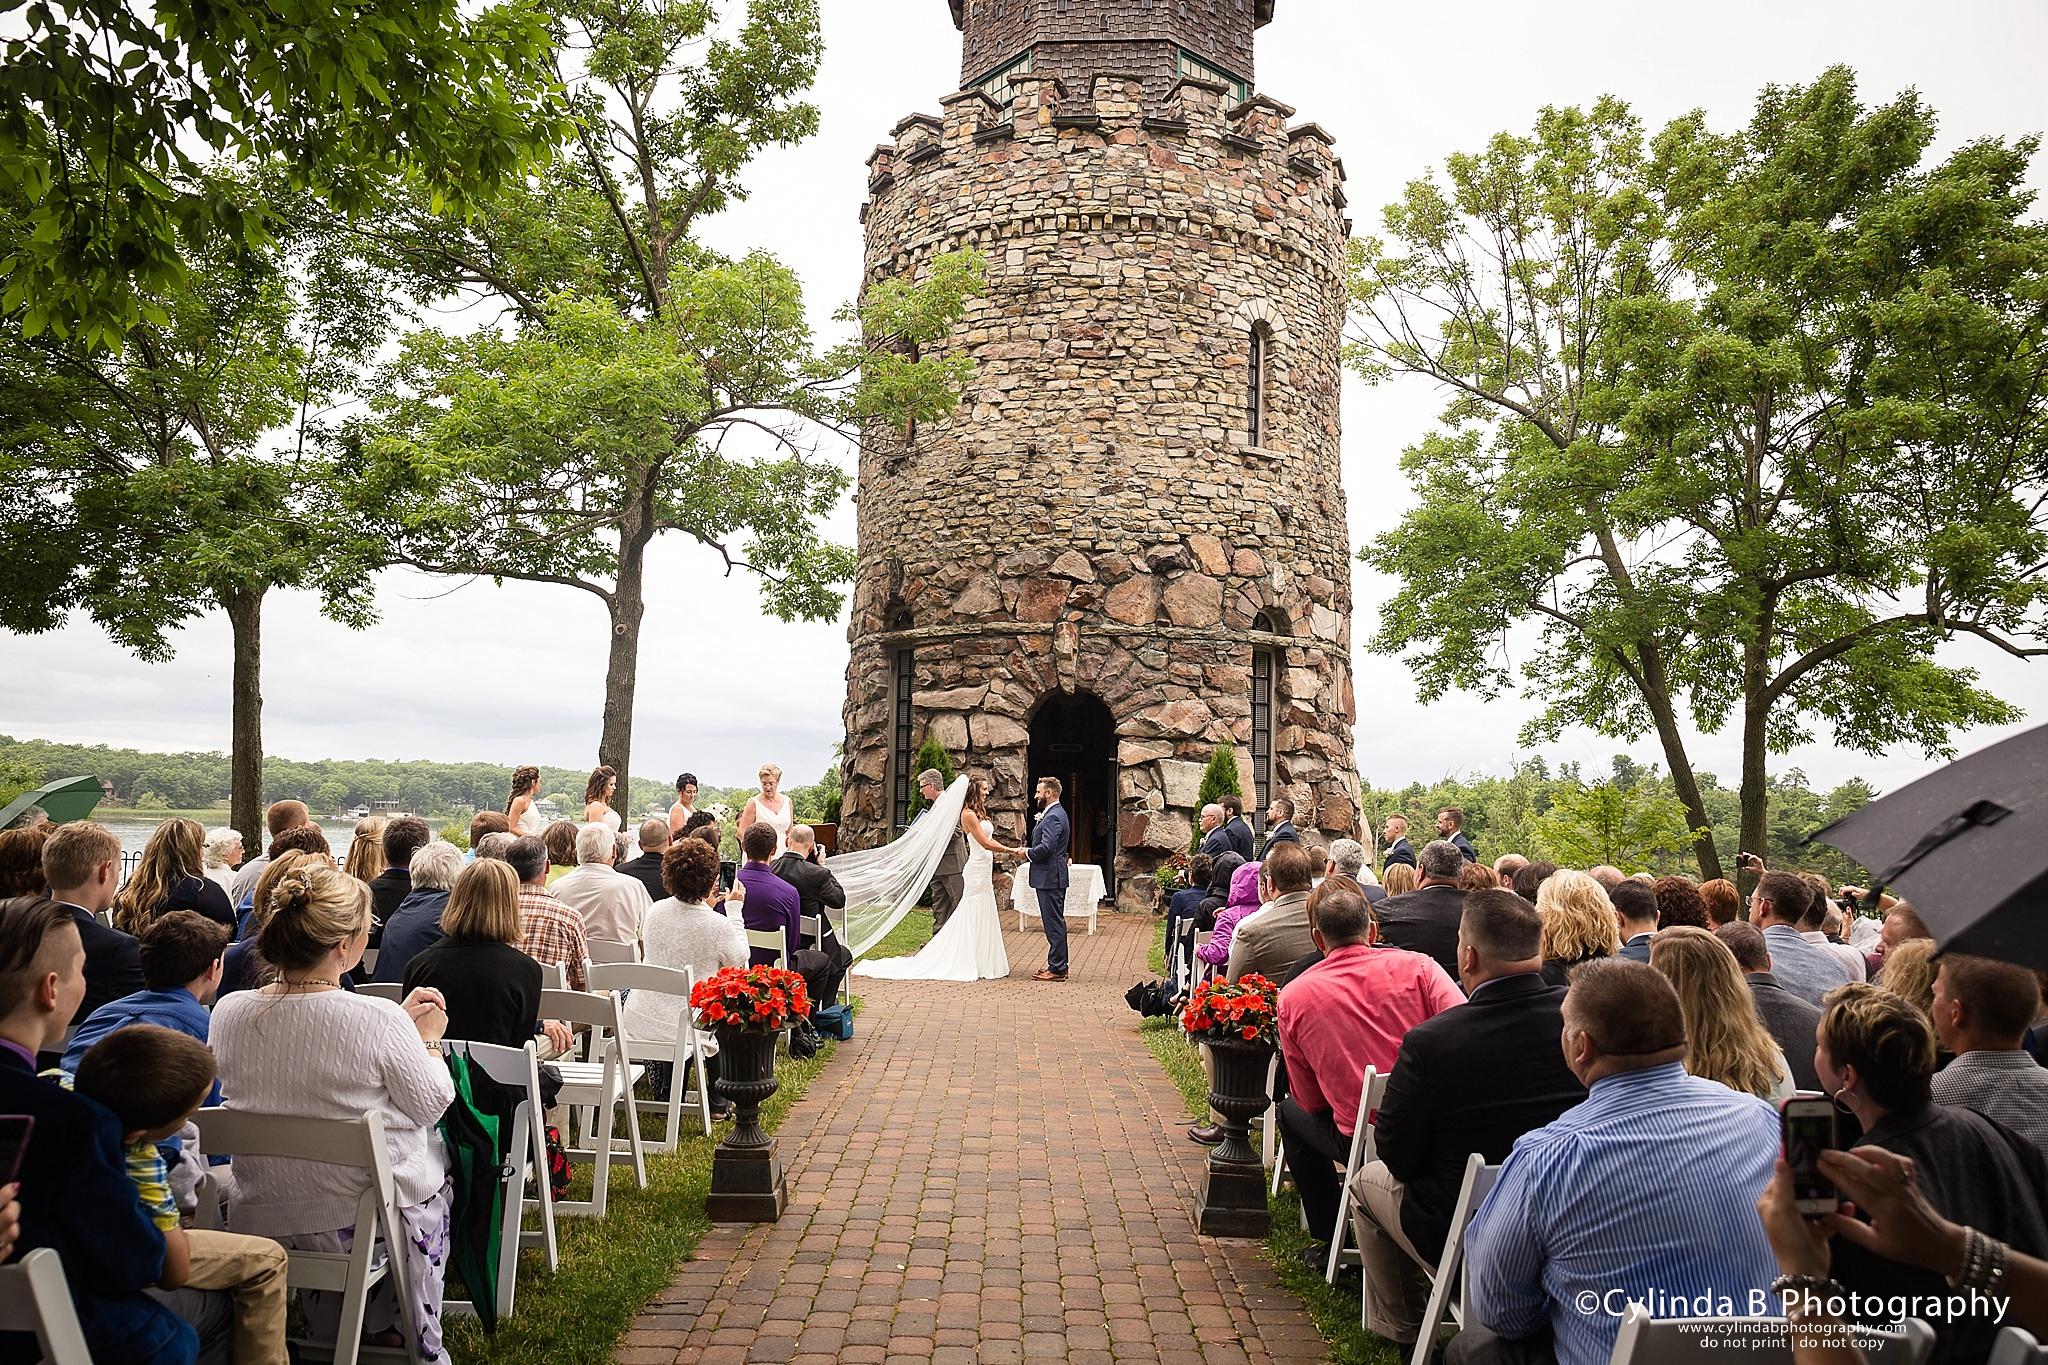 Boldt Castle Wedding, Alexandria Bay, Wedding, Photograper, Cylinda B Photography-27